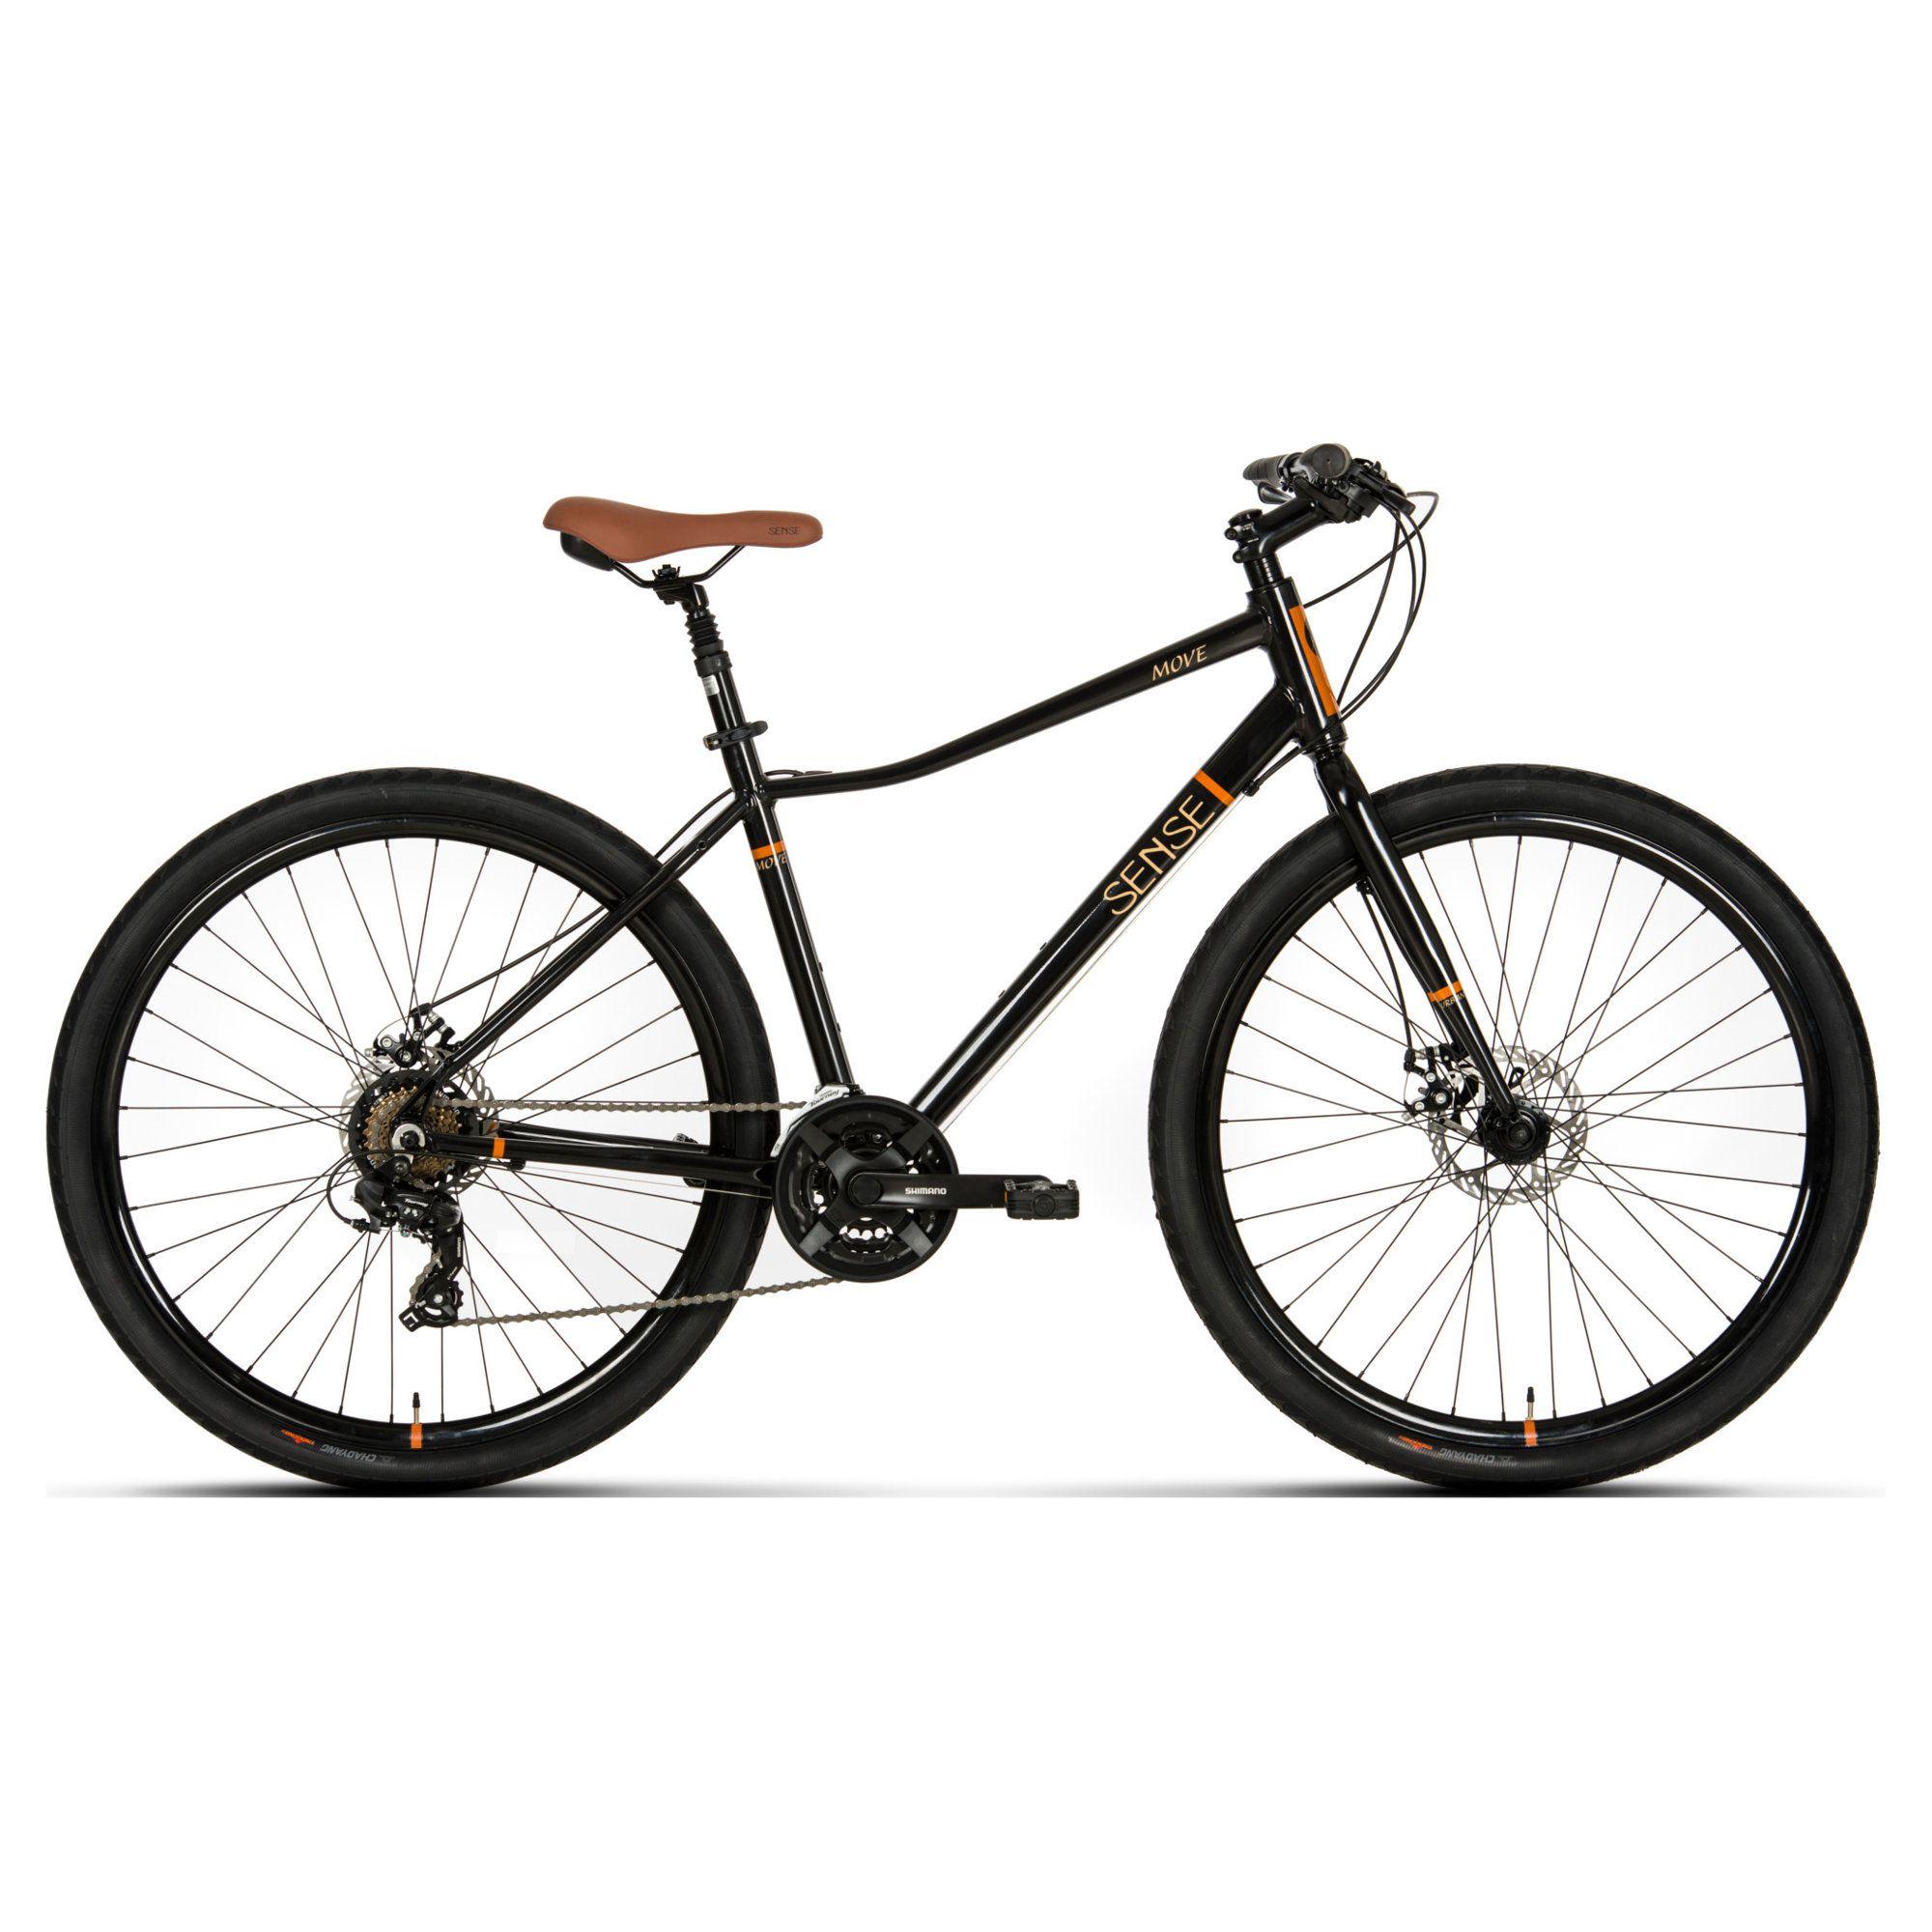 Bicicleta Urbana Sense Move Disc 21v 2019